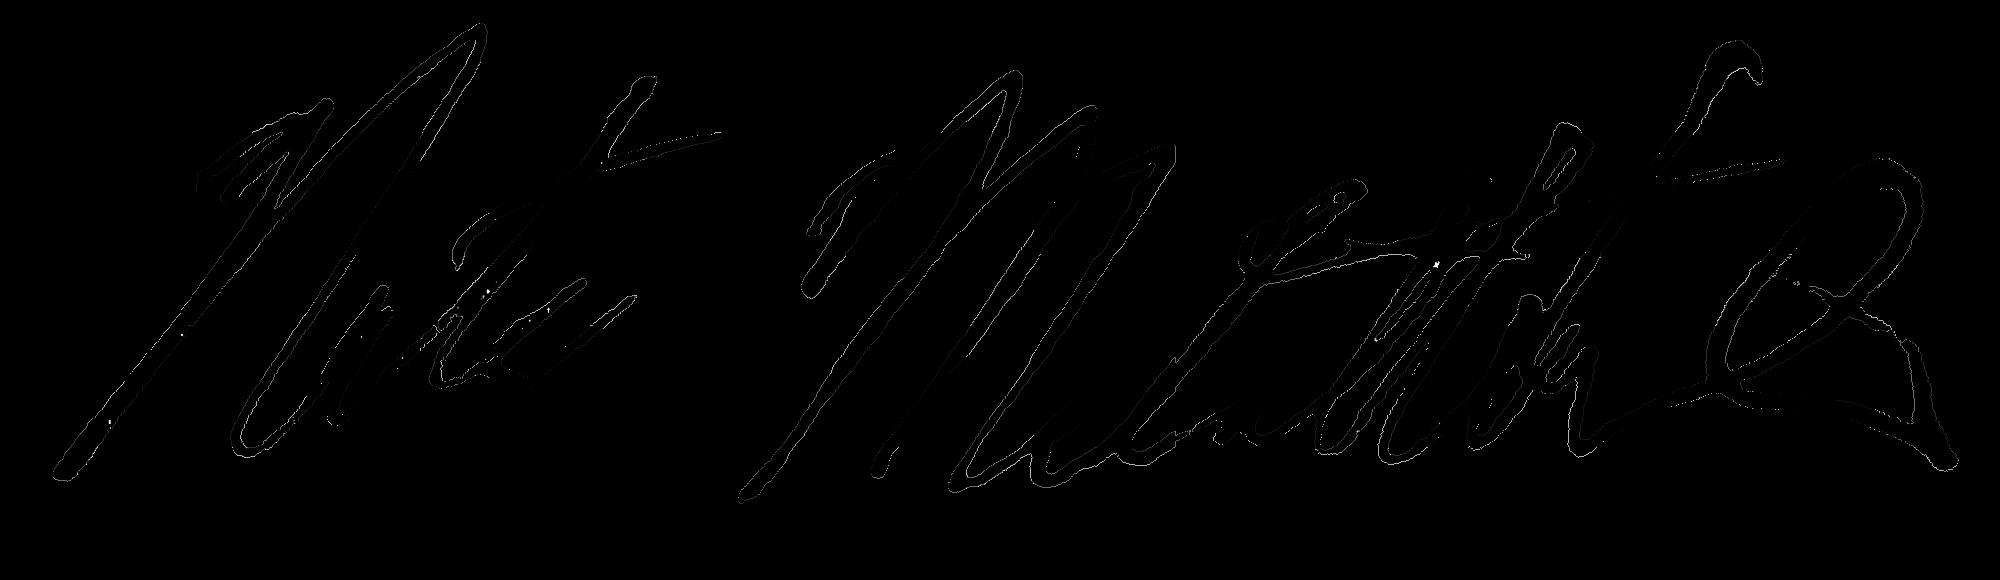 Signature transparent final